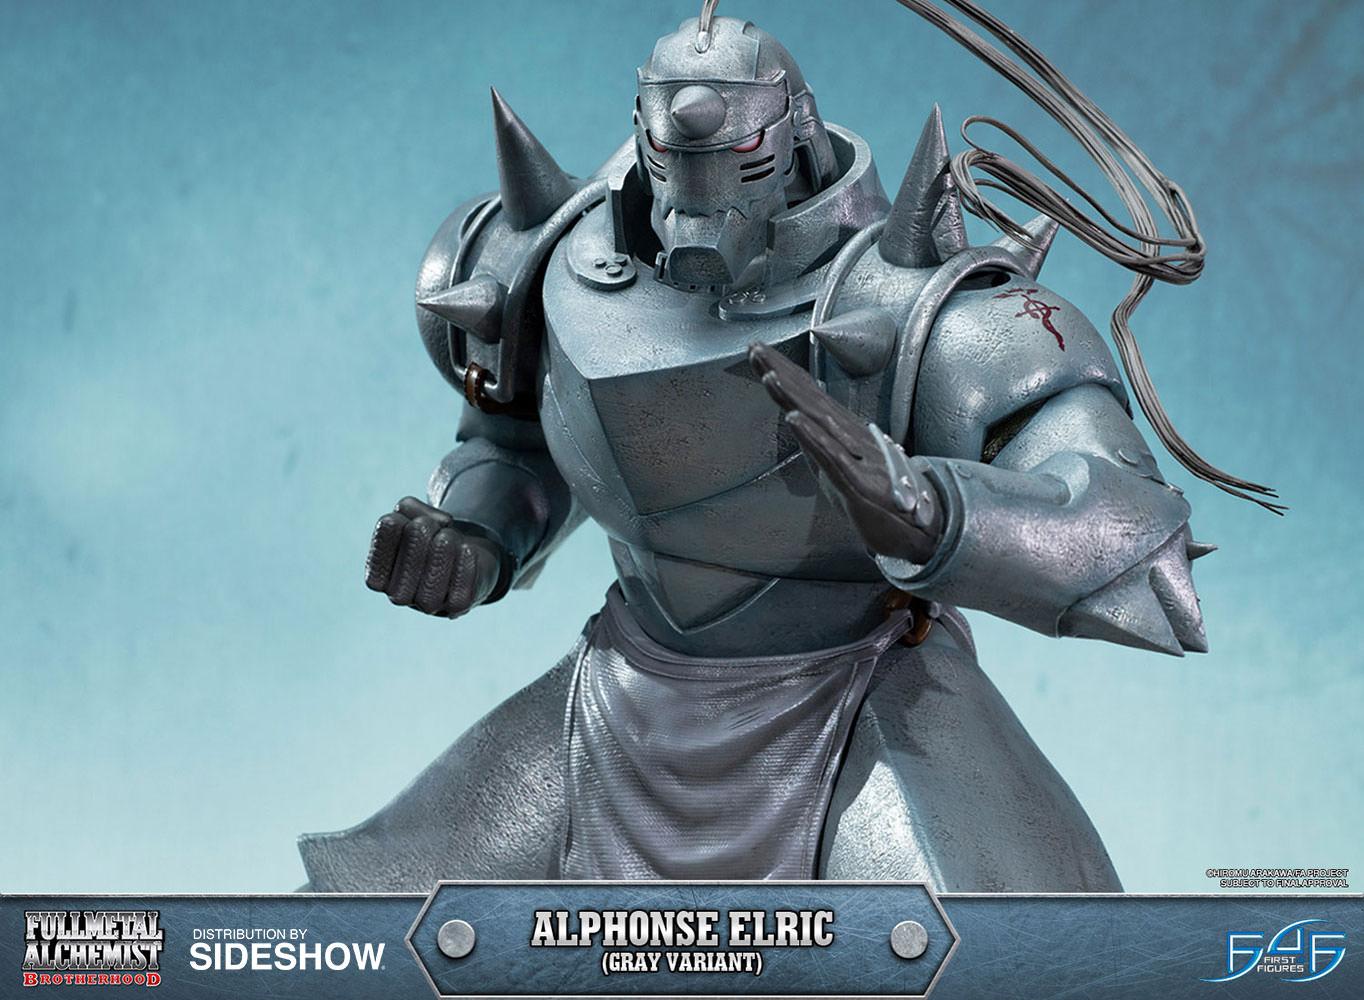 Al Elric fullmetal alchemist alphonse elric gray variant statuefi